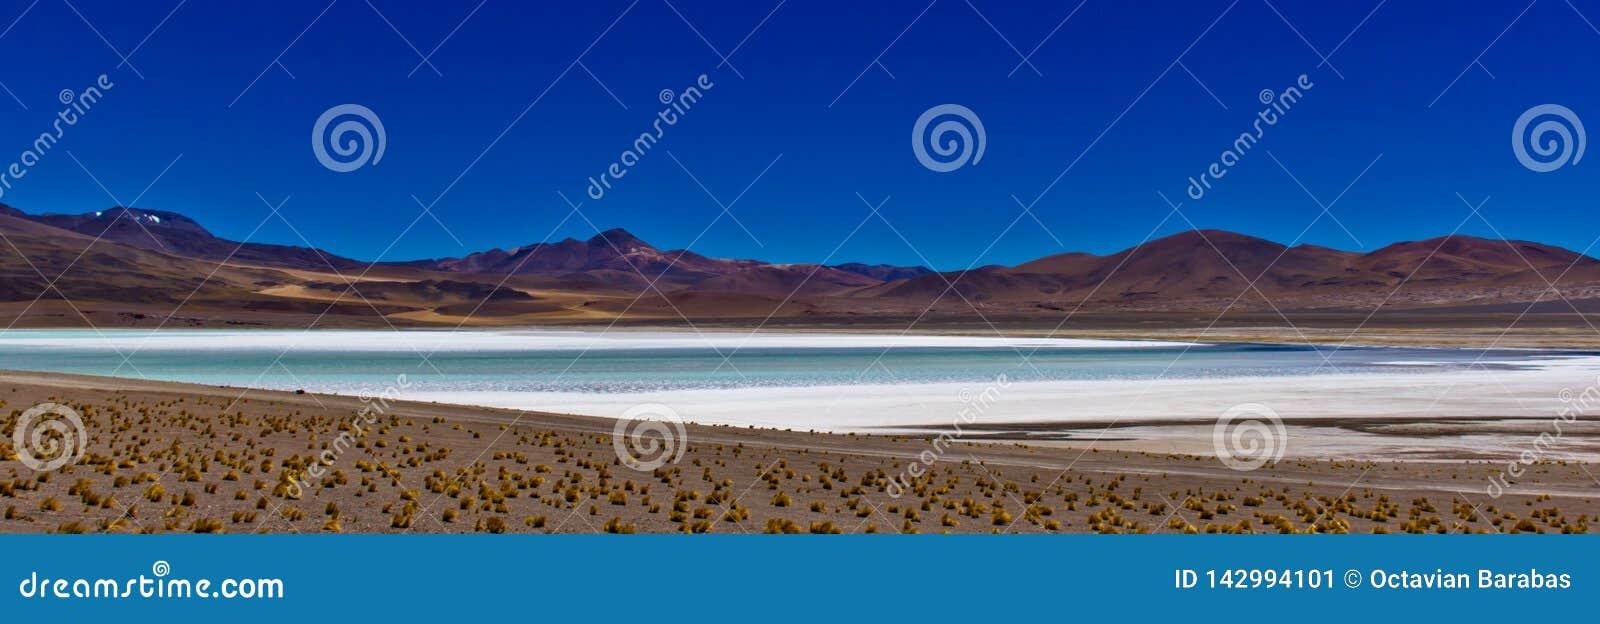 Panorama del lago di sale in Atacama/Cile